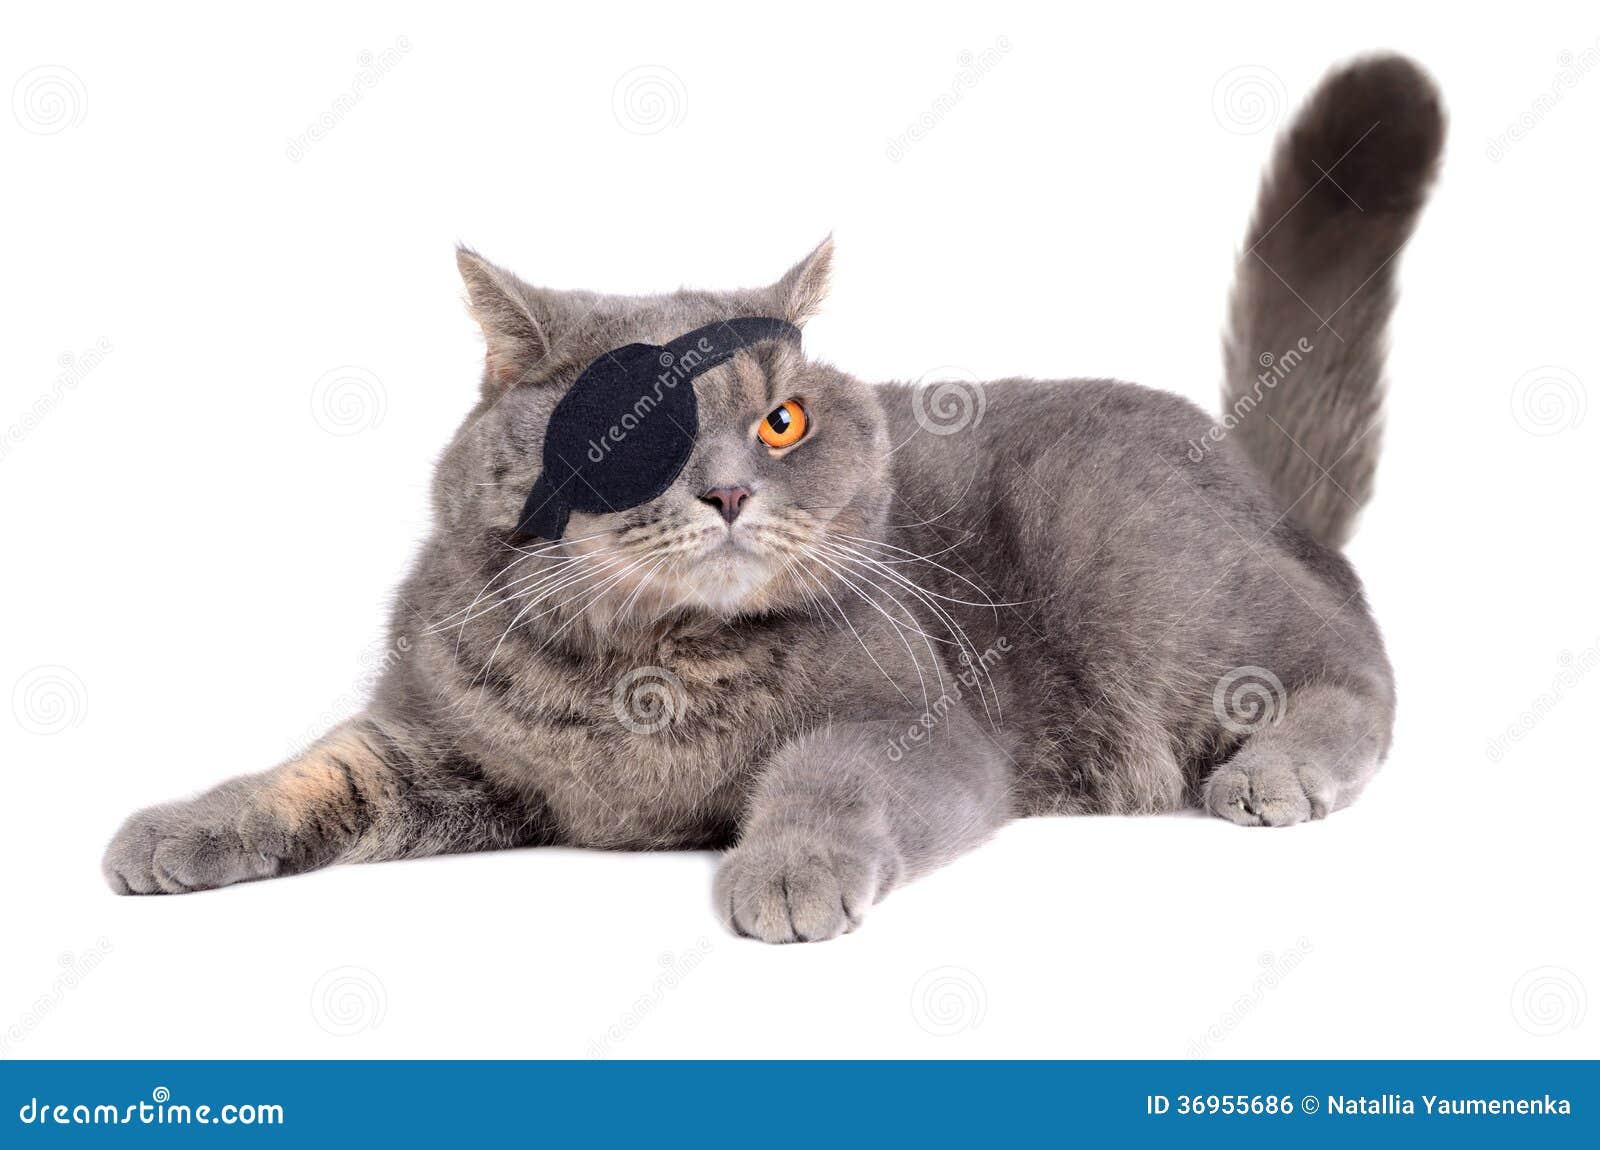 Cat In Pirate Halloween Costume Video